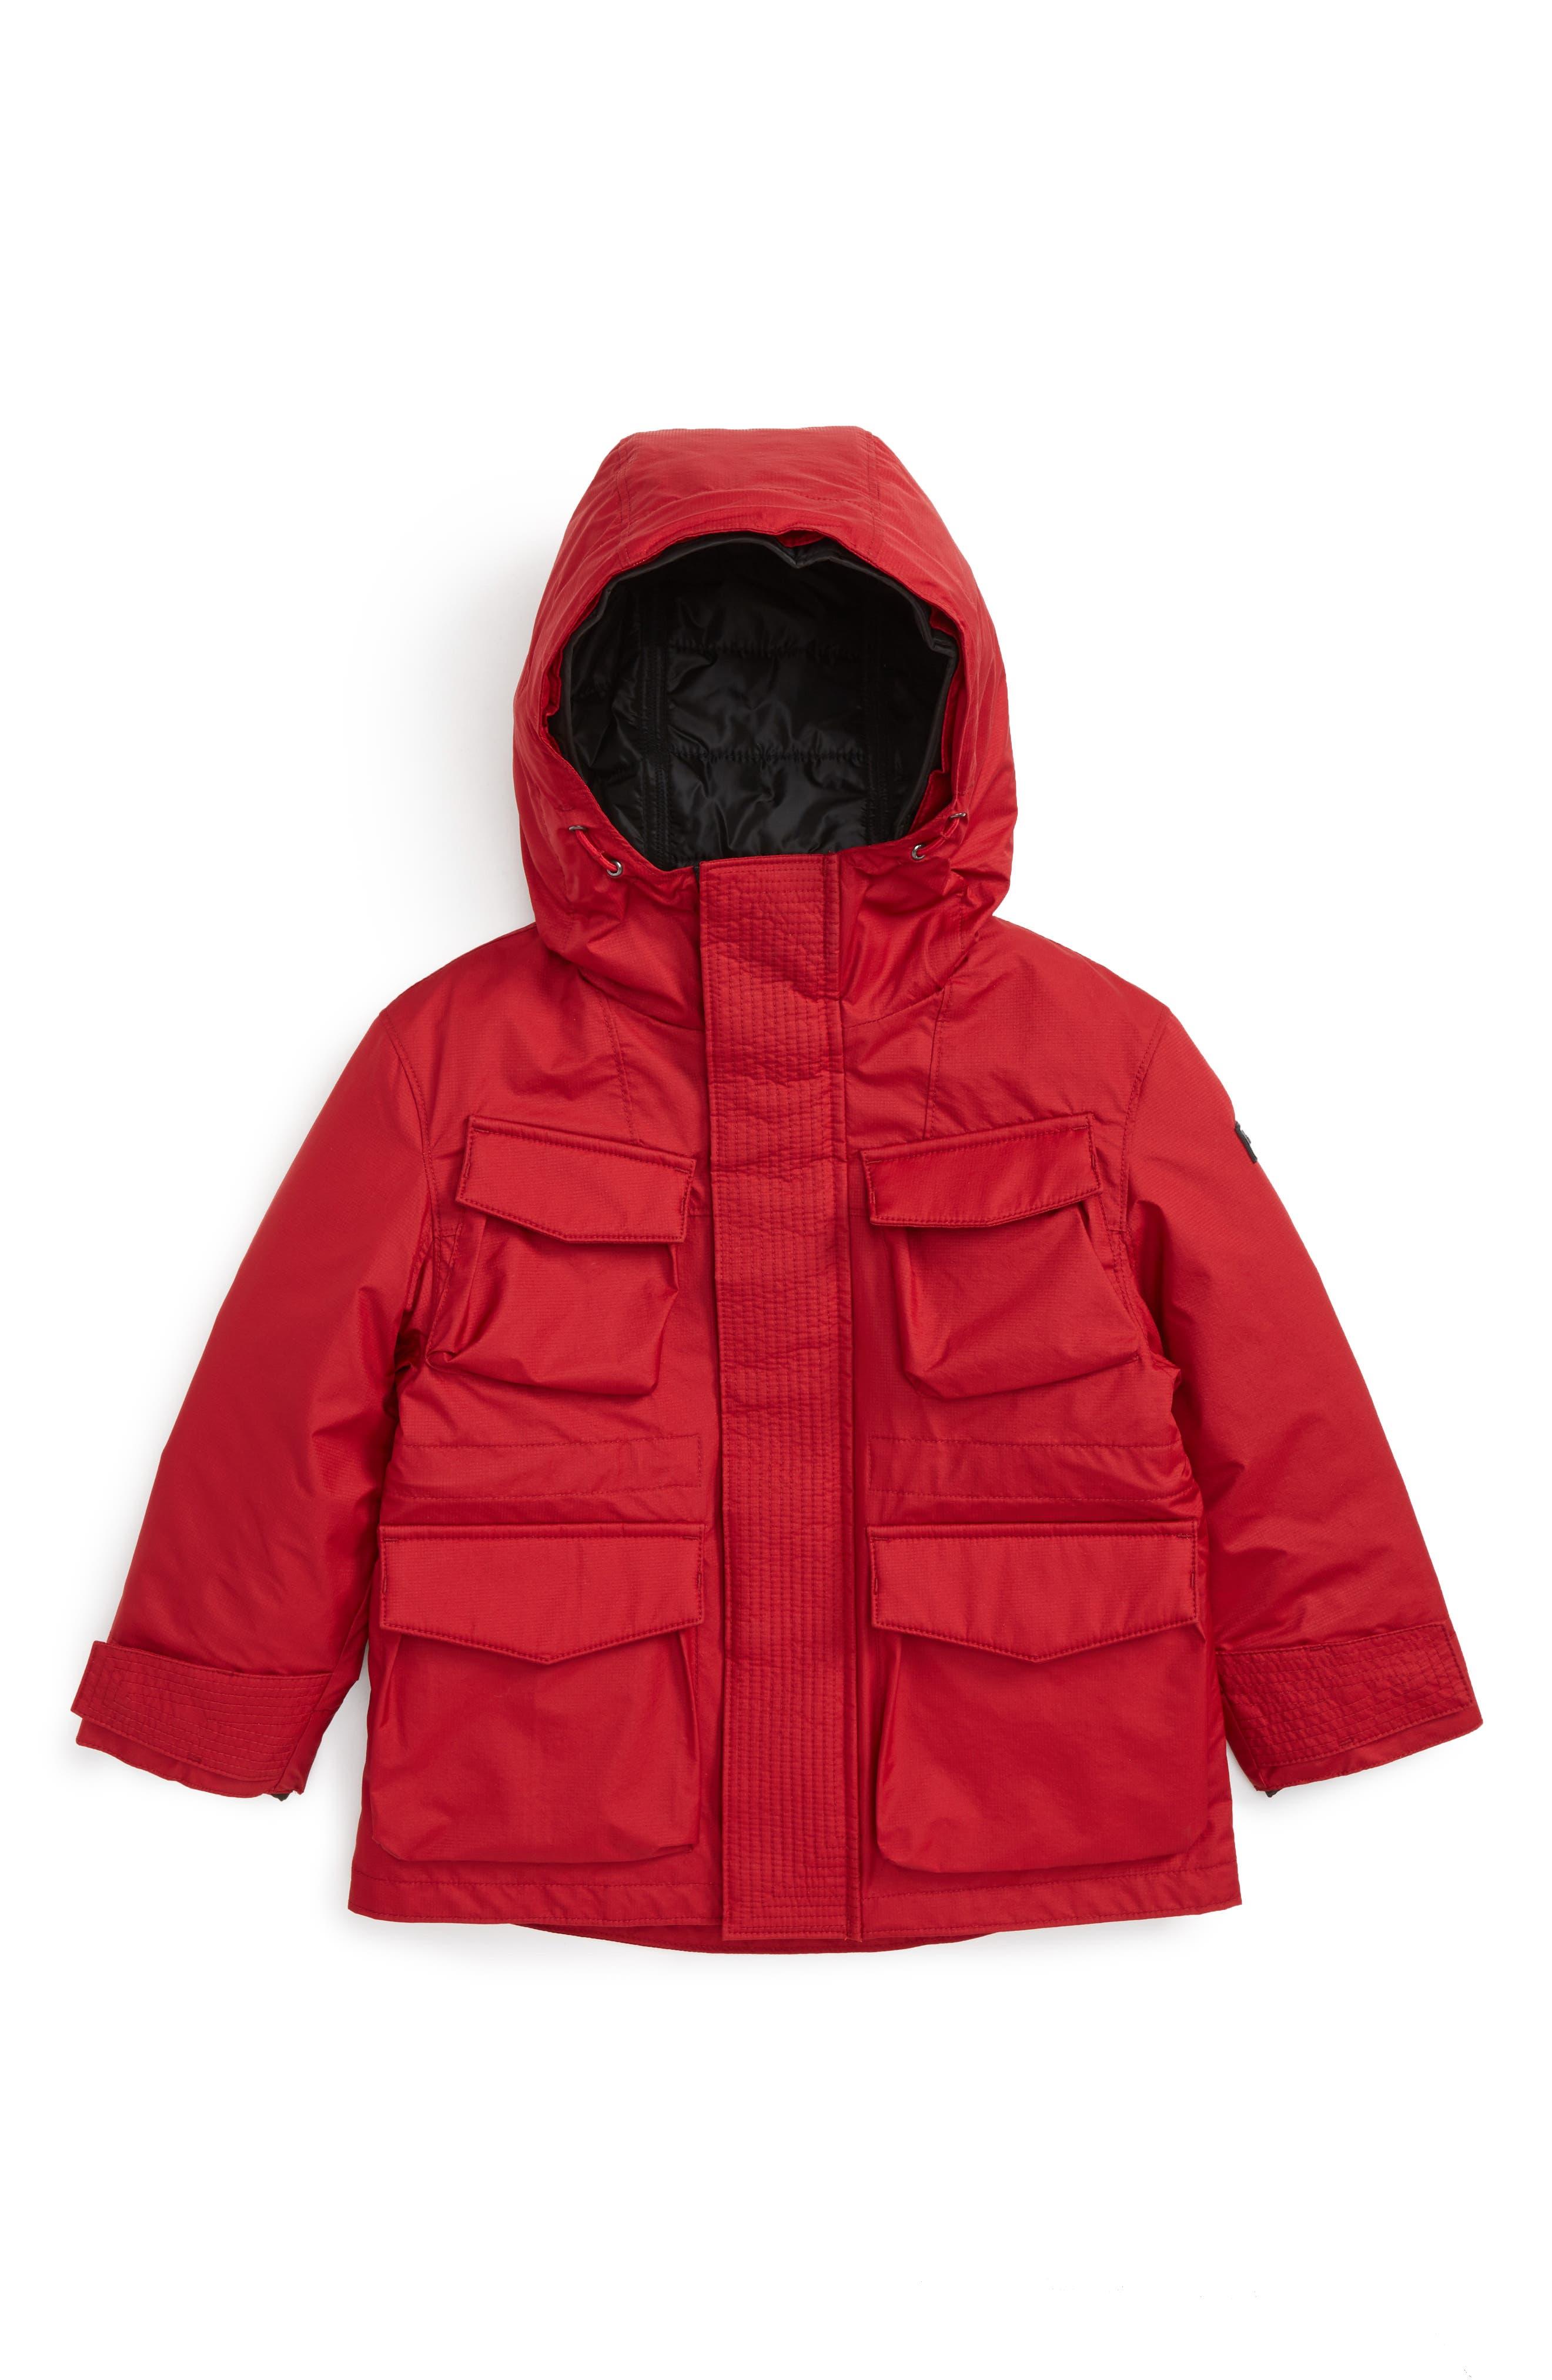 Terrick 3-in-1 Jacket,                         Main,                         color, 604